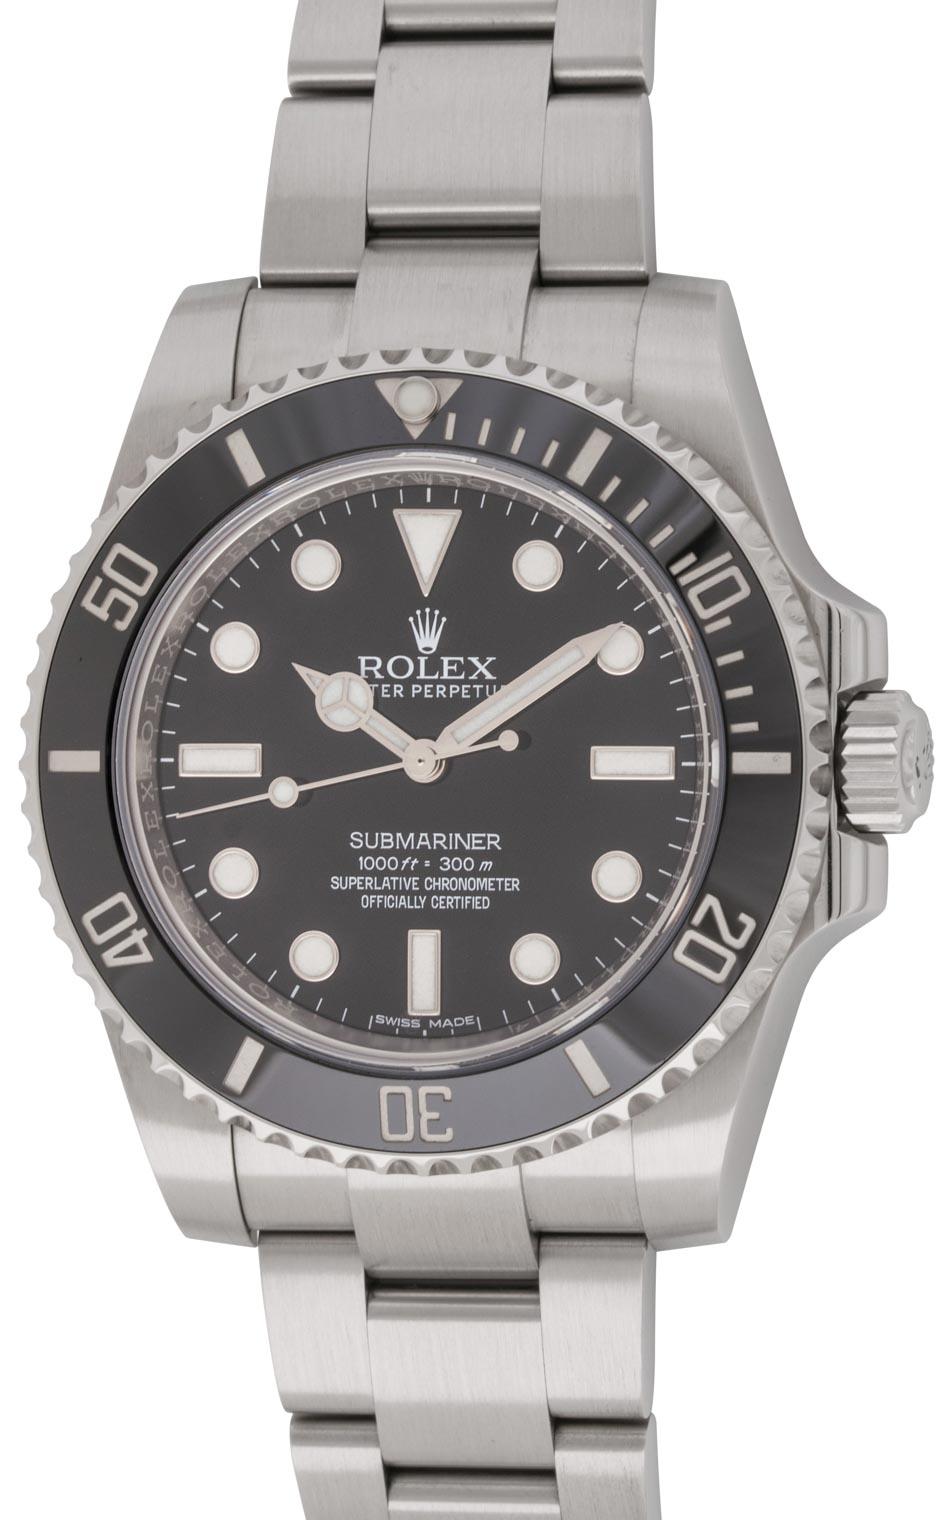 rolex submariner 114060 bernard watch. Black Bedroom Furniture Sets. Home Design Ideas